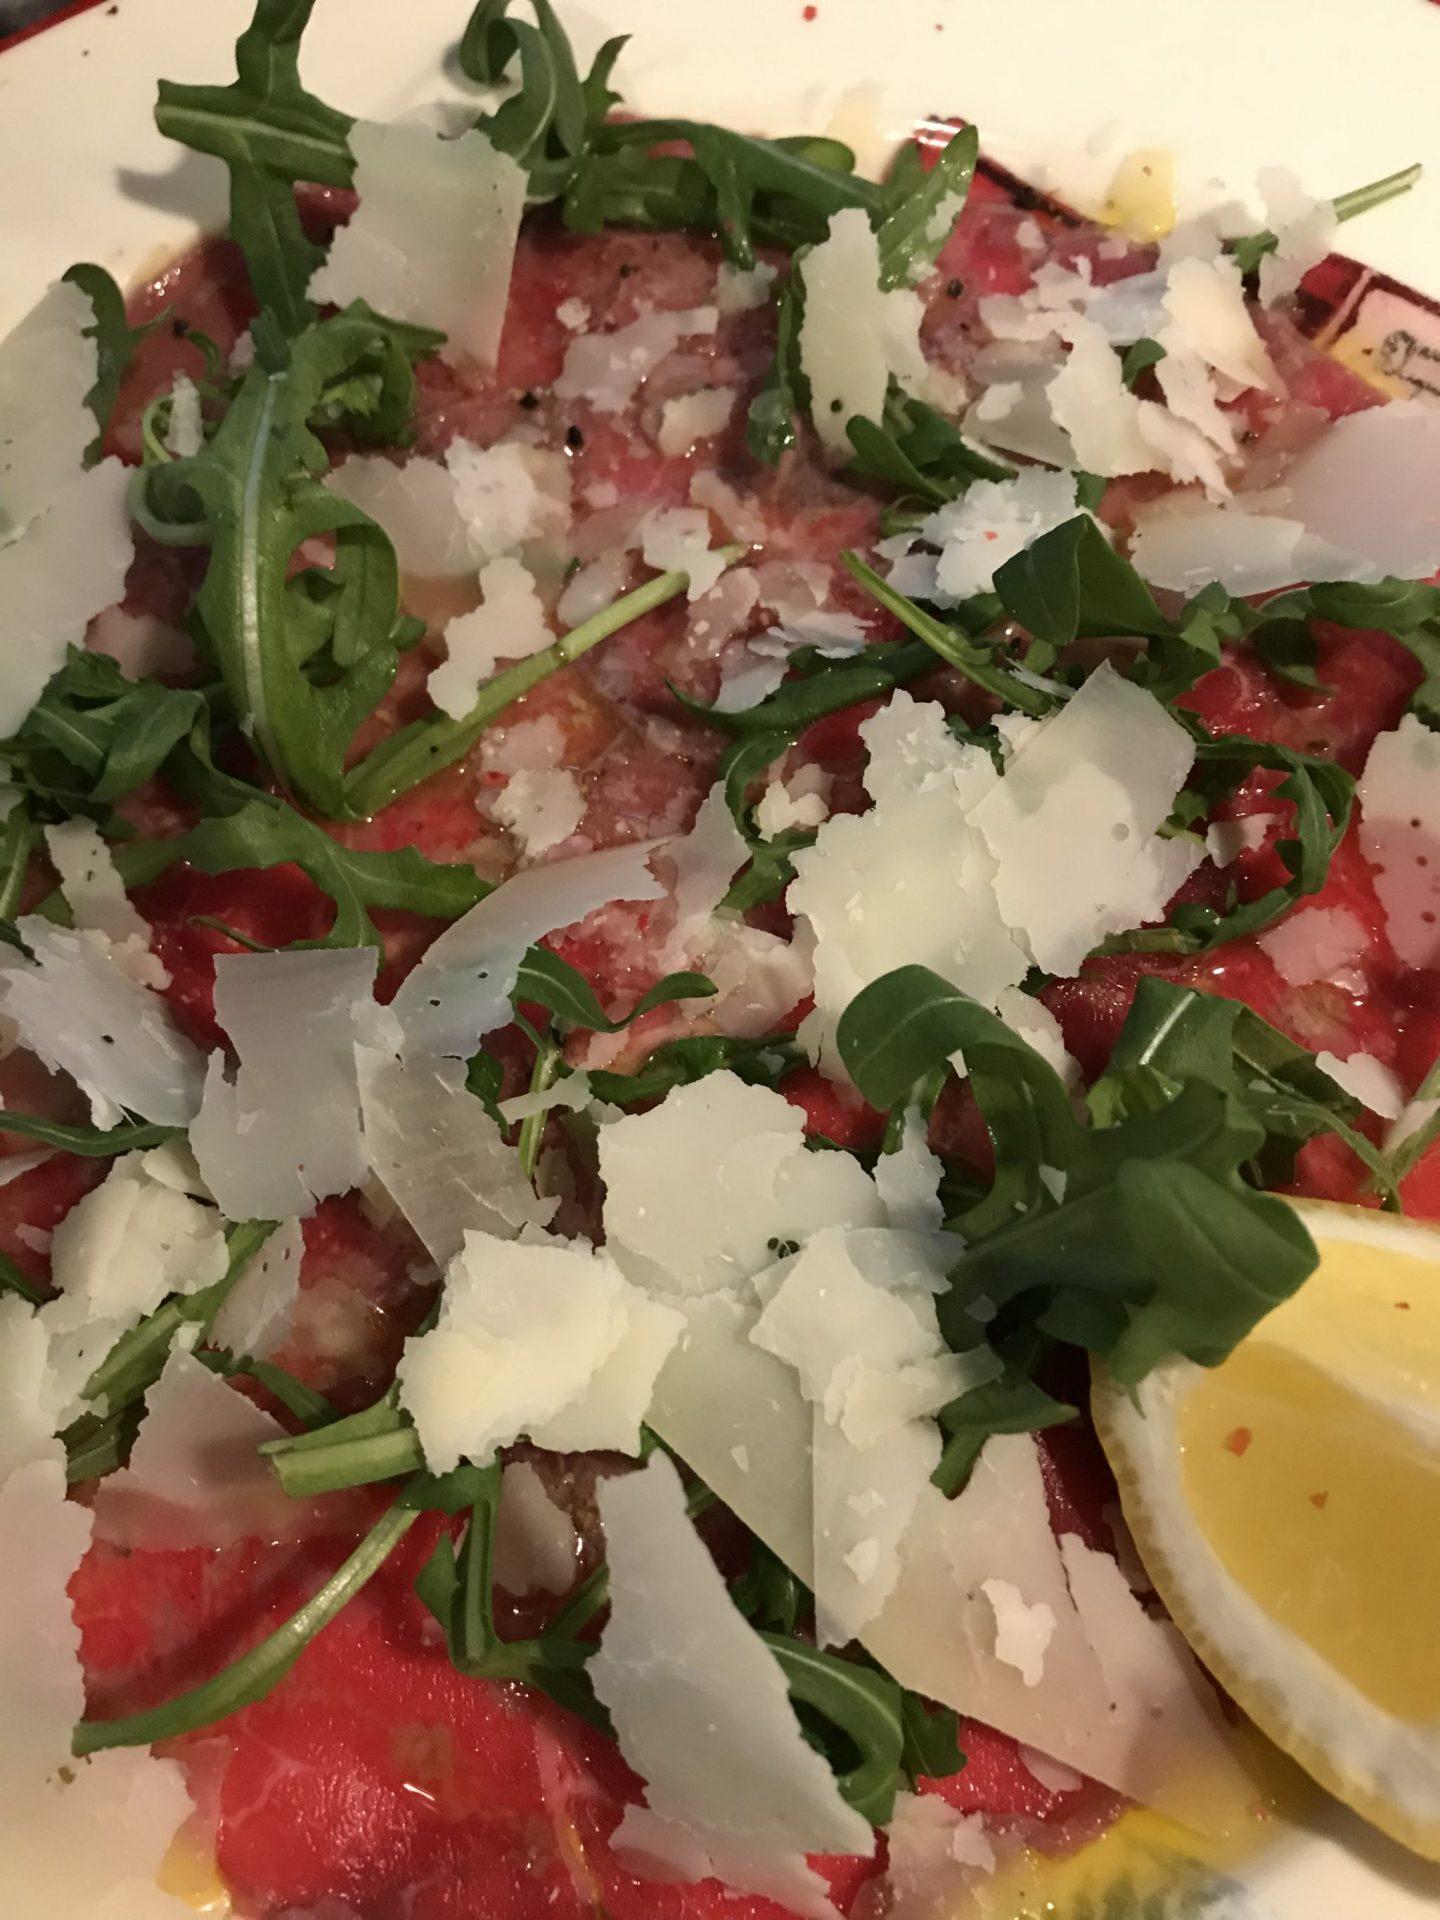 Carpaccio Erfahrung Trattoria Villa Conte Herne Foodblog Sternestulle